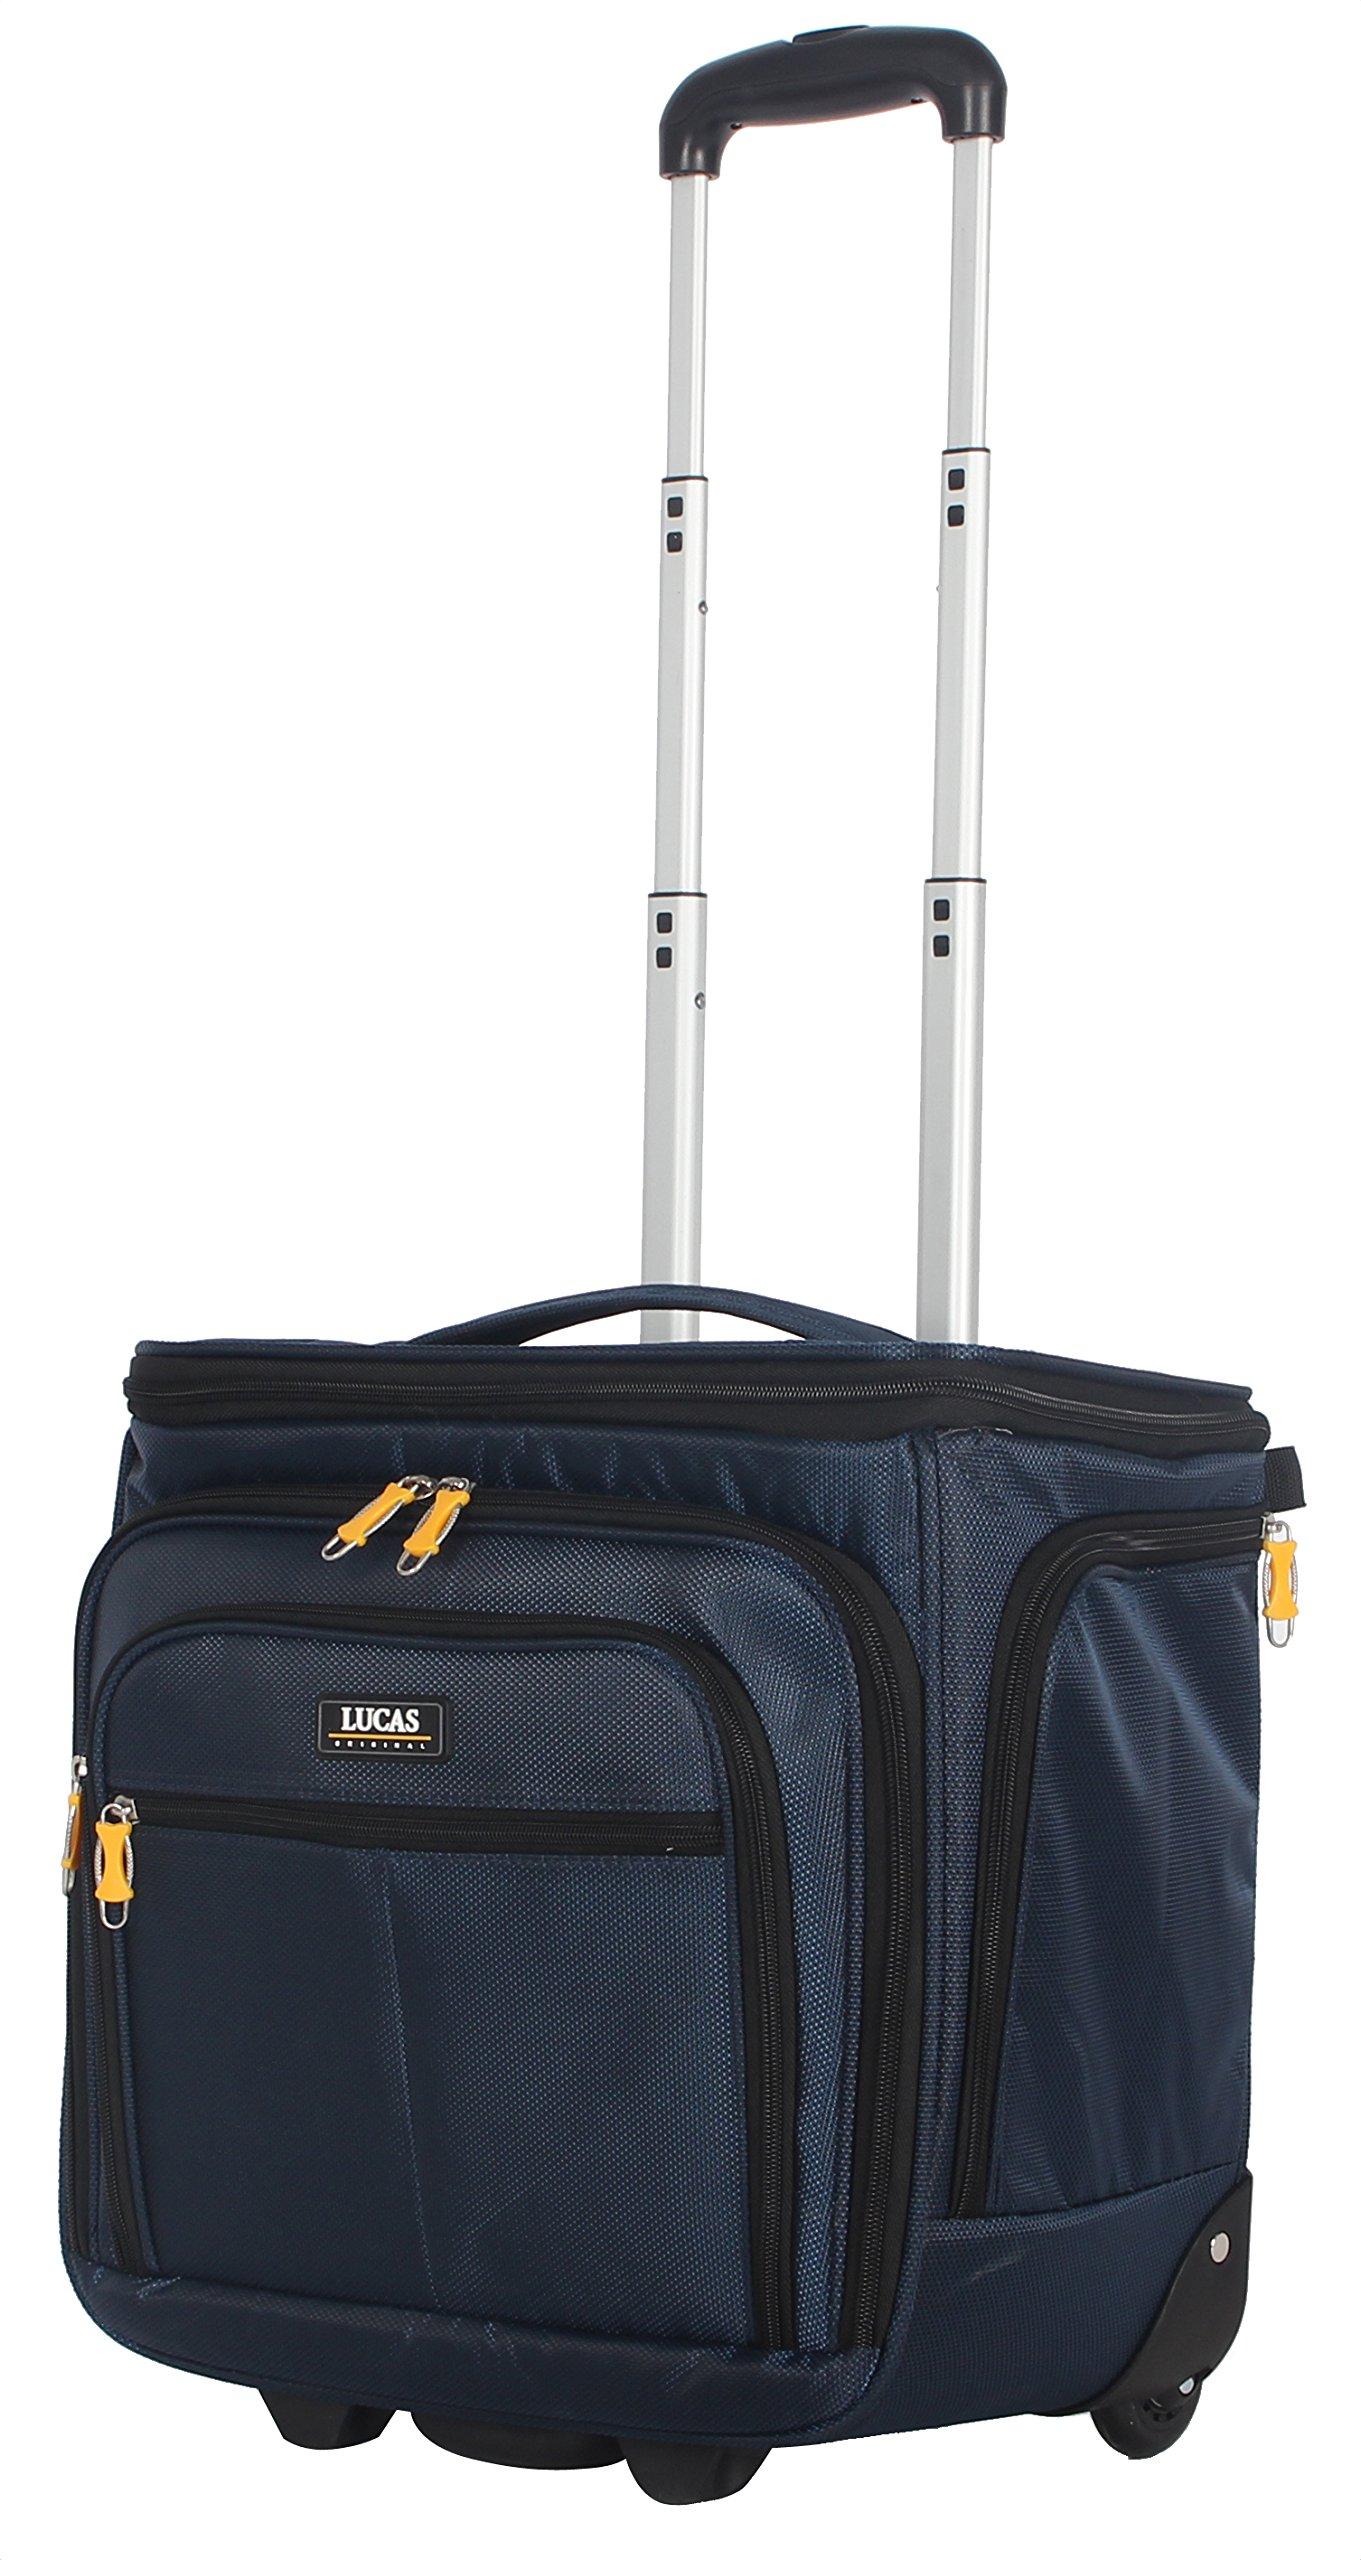 Lucas Luggage Carry Expandable Wheeled